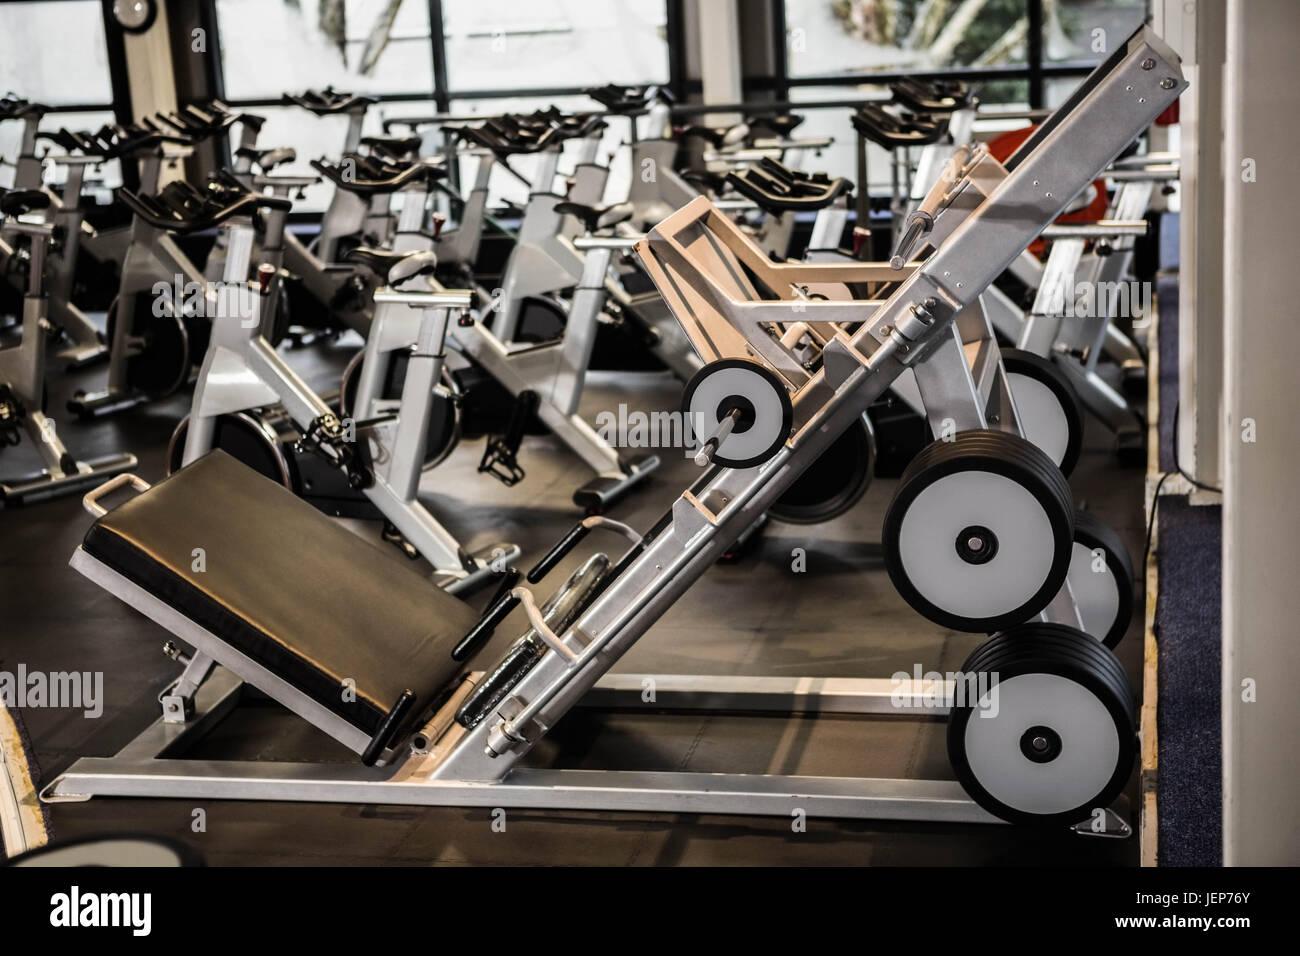 Exercise machines - Stock Image